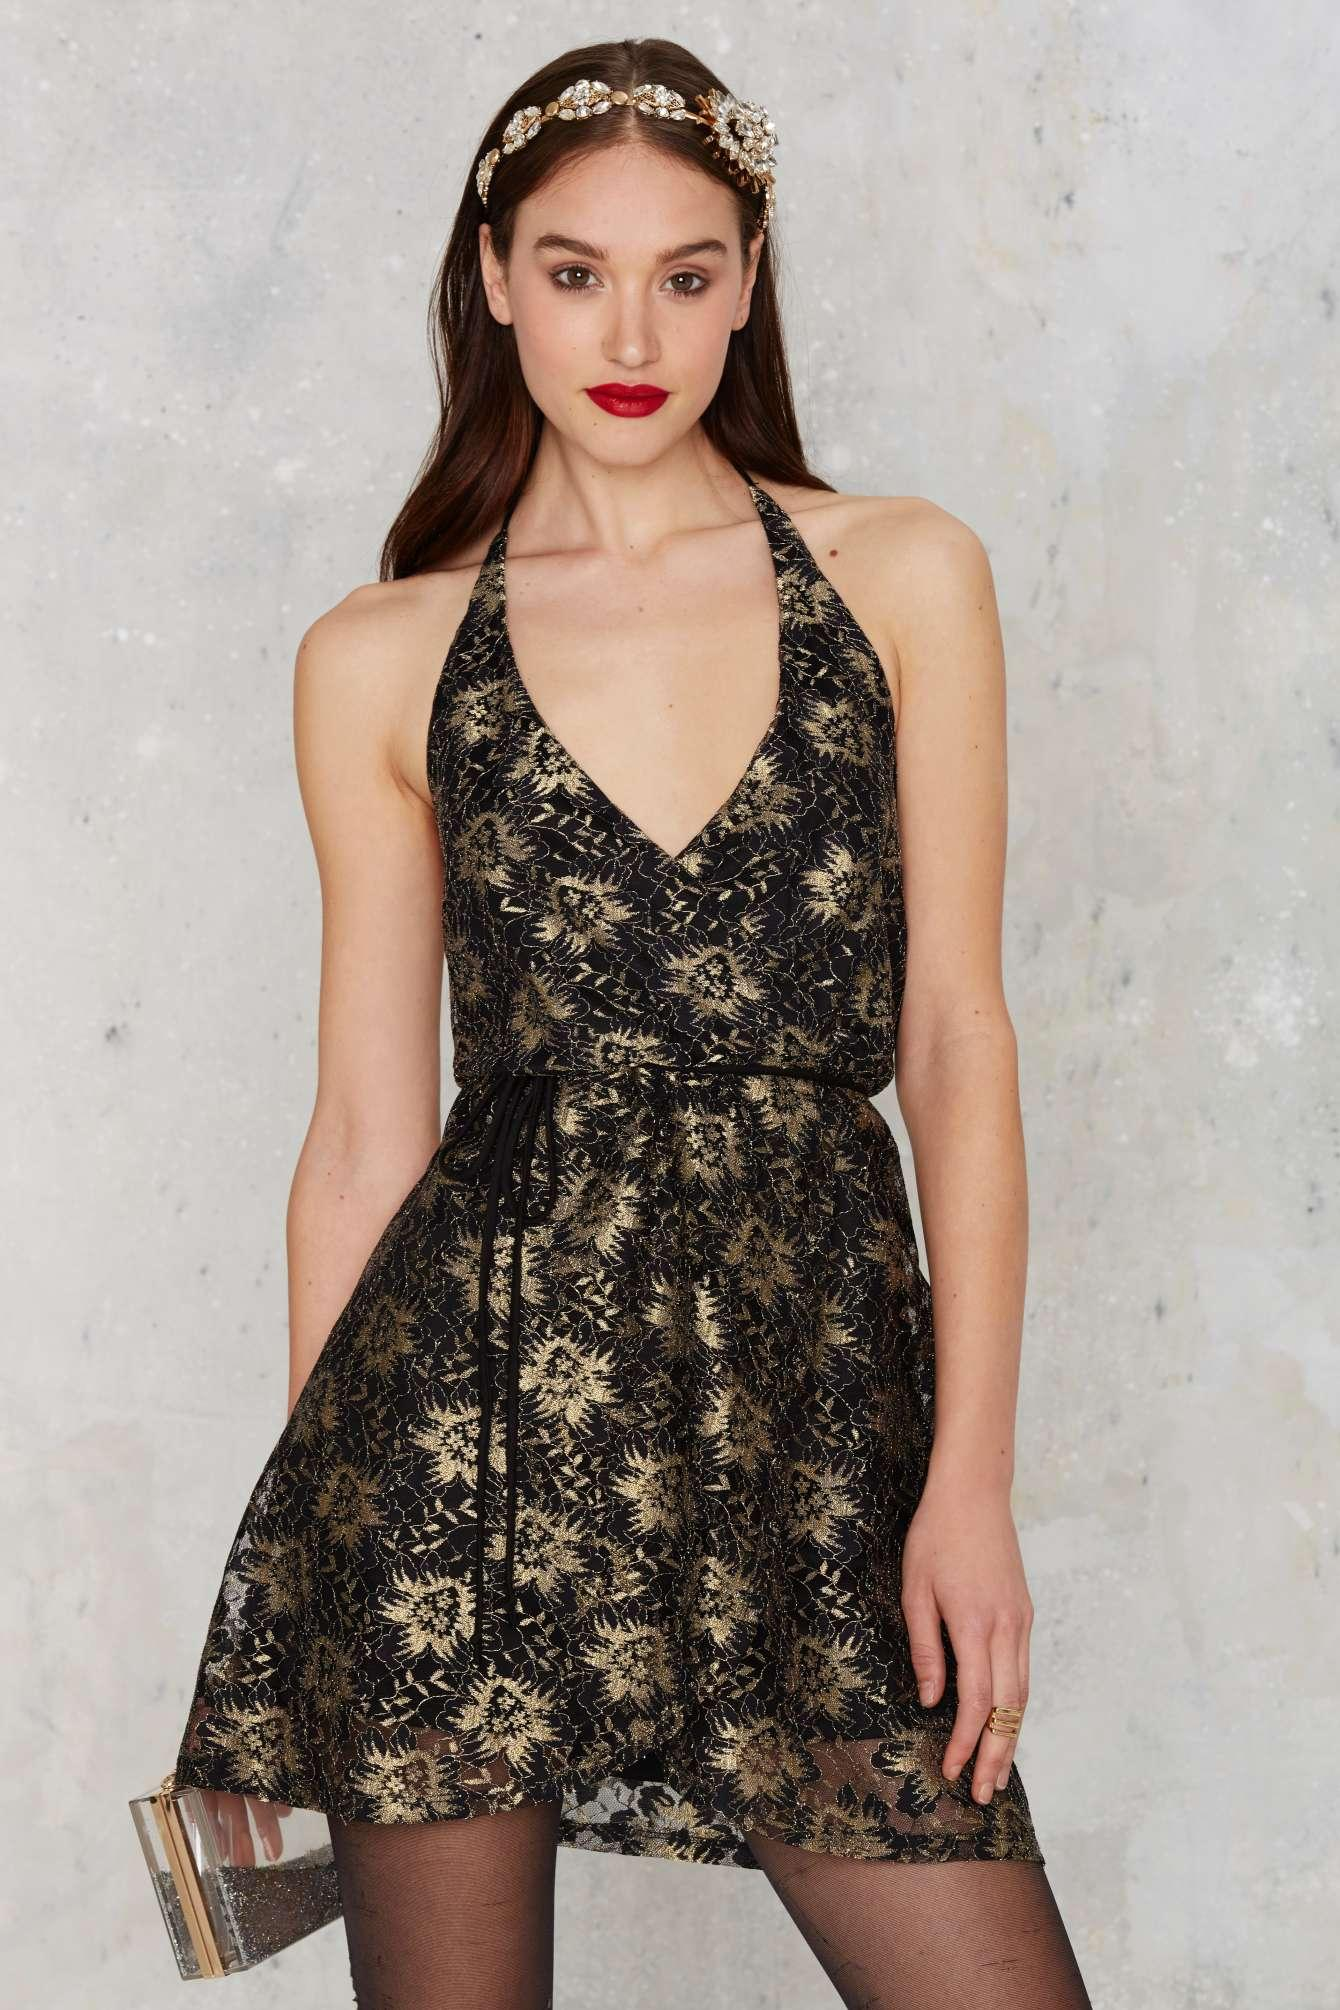 Lyst - Nasty Gal After Party Vintage Pon De Floral Dress in Metallic d2ece516d